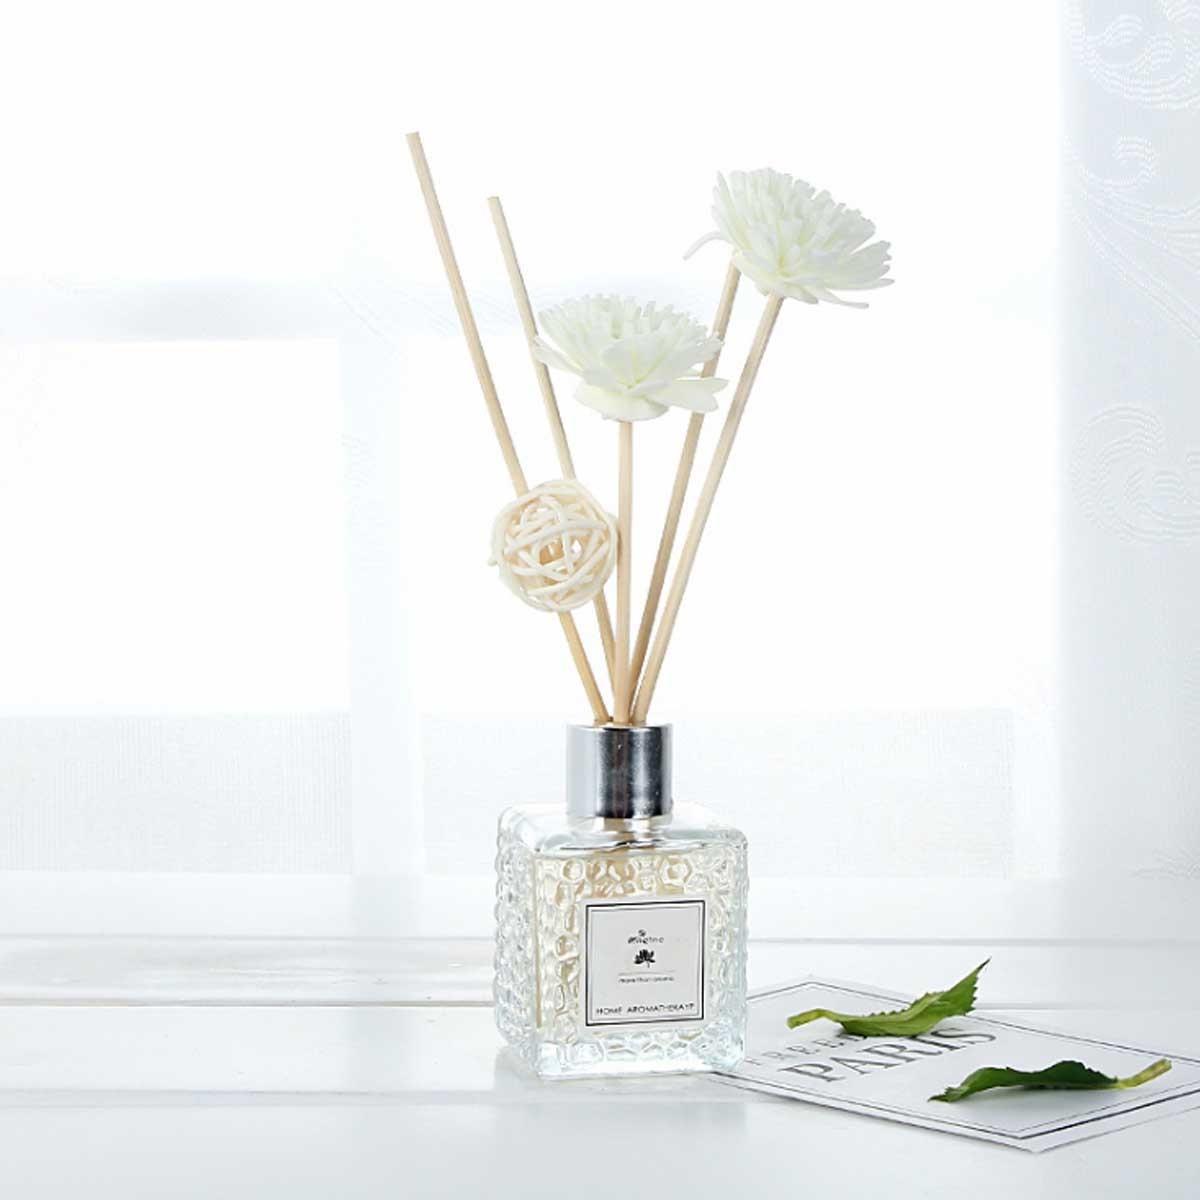 Longfine 法式家用香薰 - 英國梨與小蒼蘭